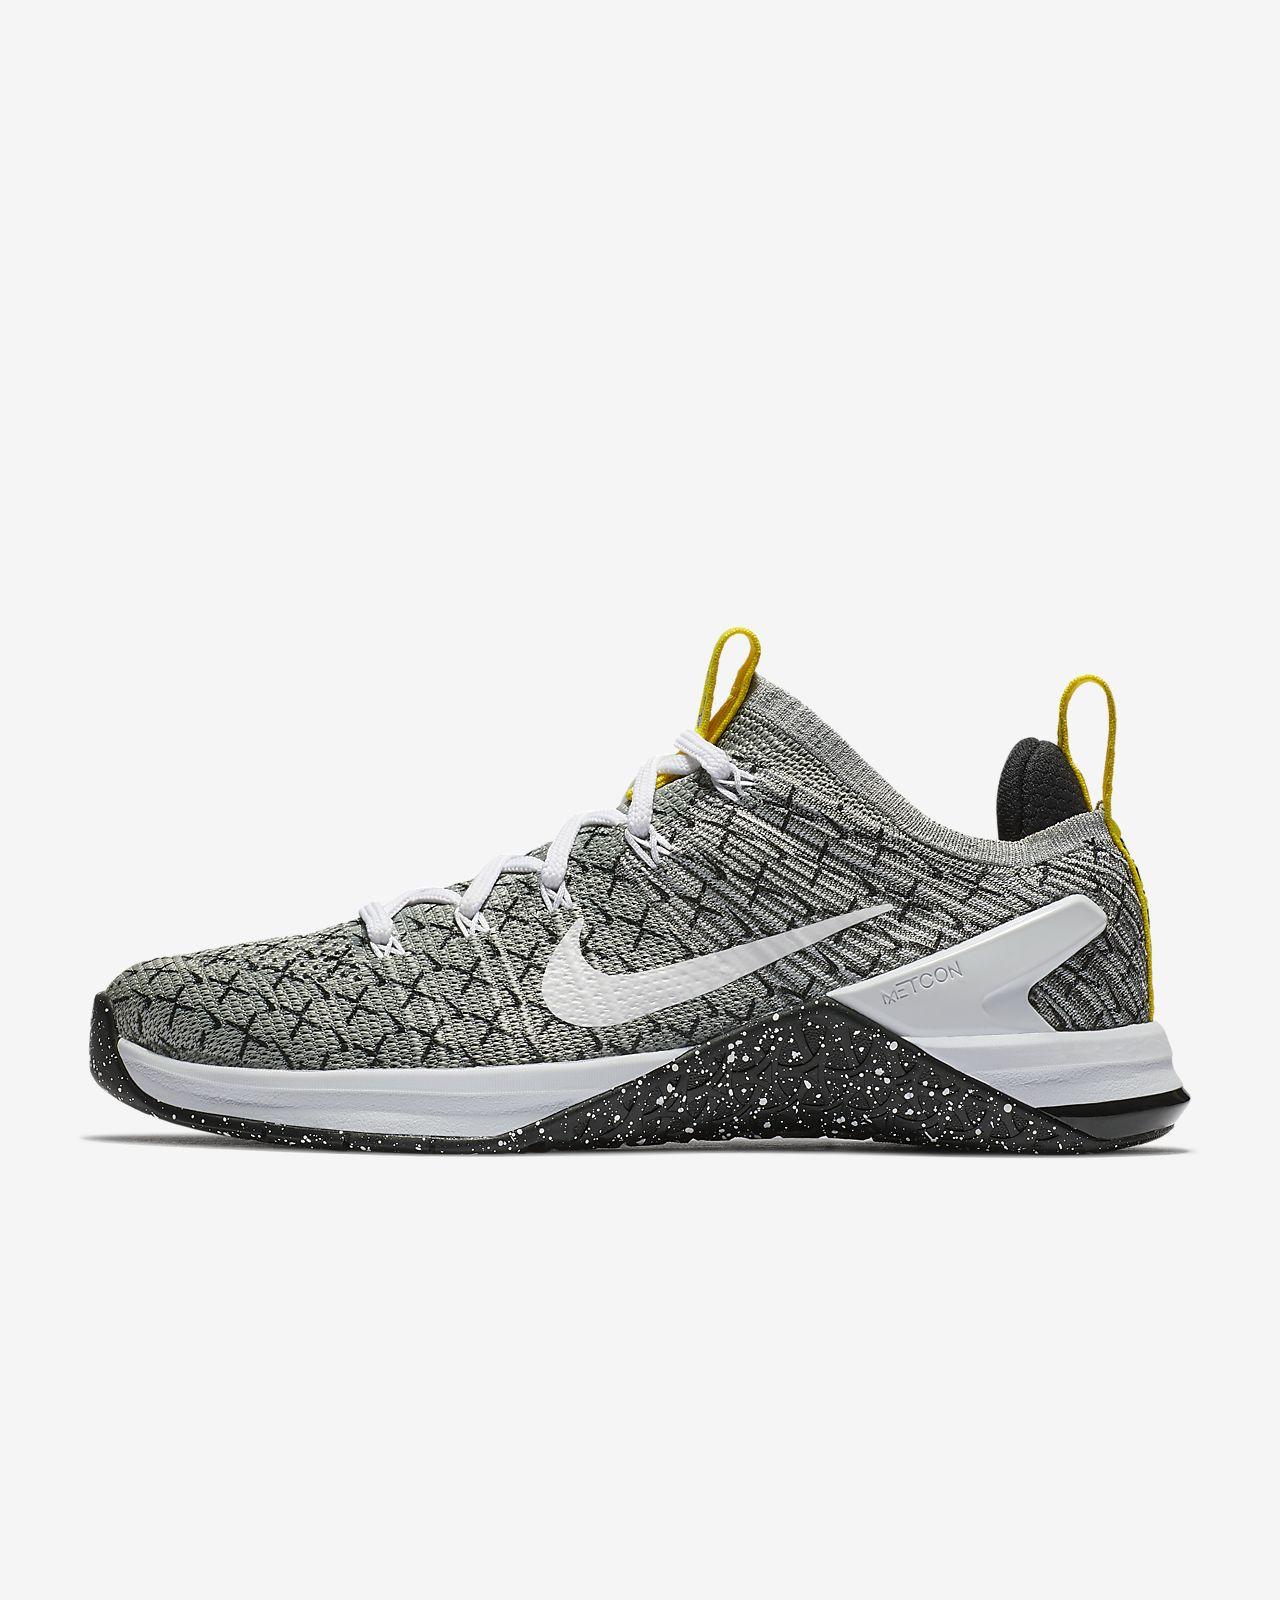 De Training H2ied9 Boxe Metcon Chaussure Dsx Fitness Nike Et